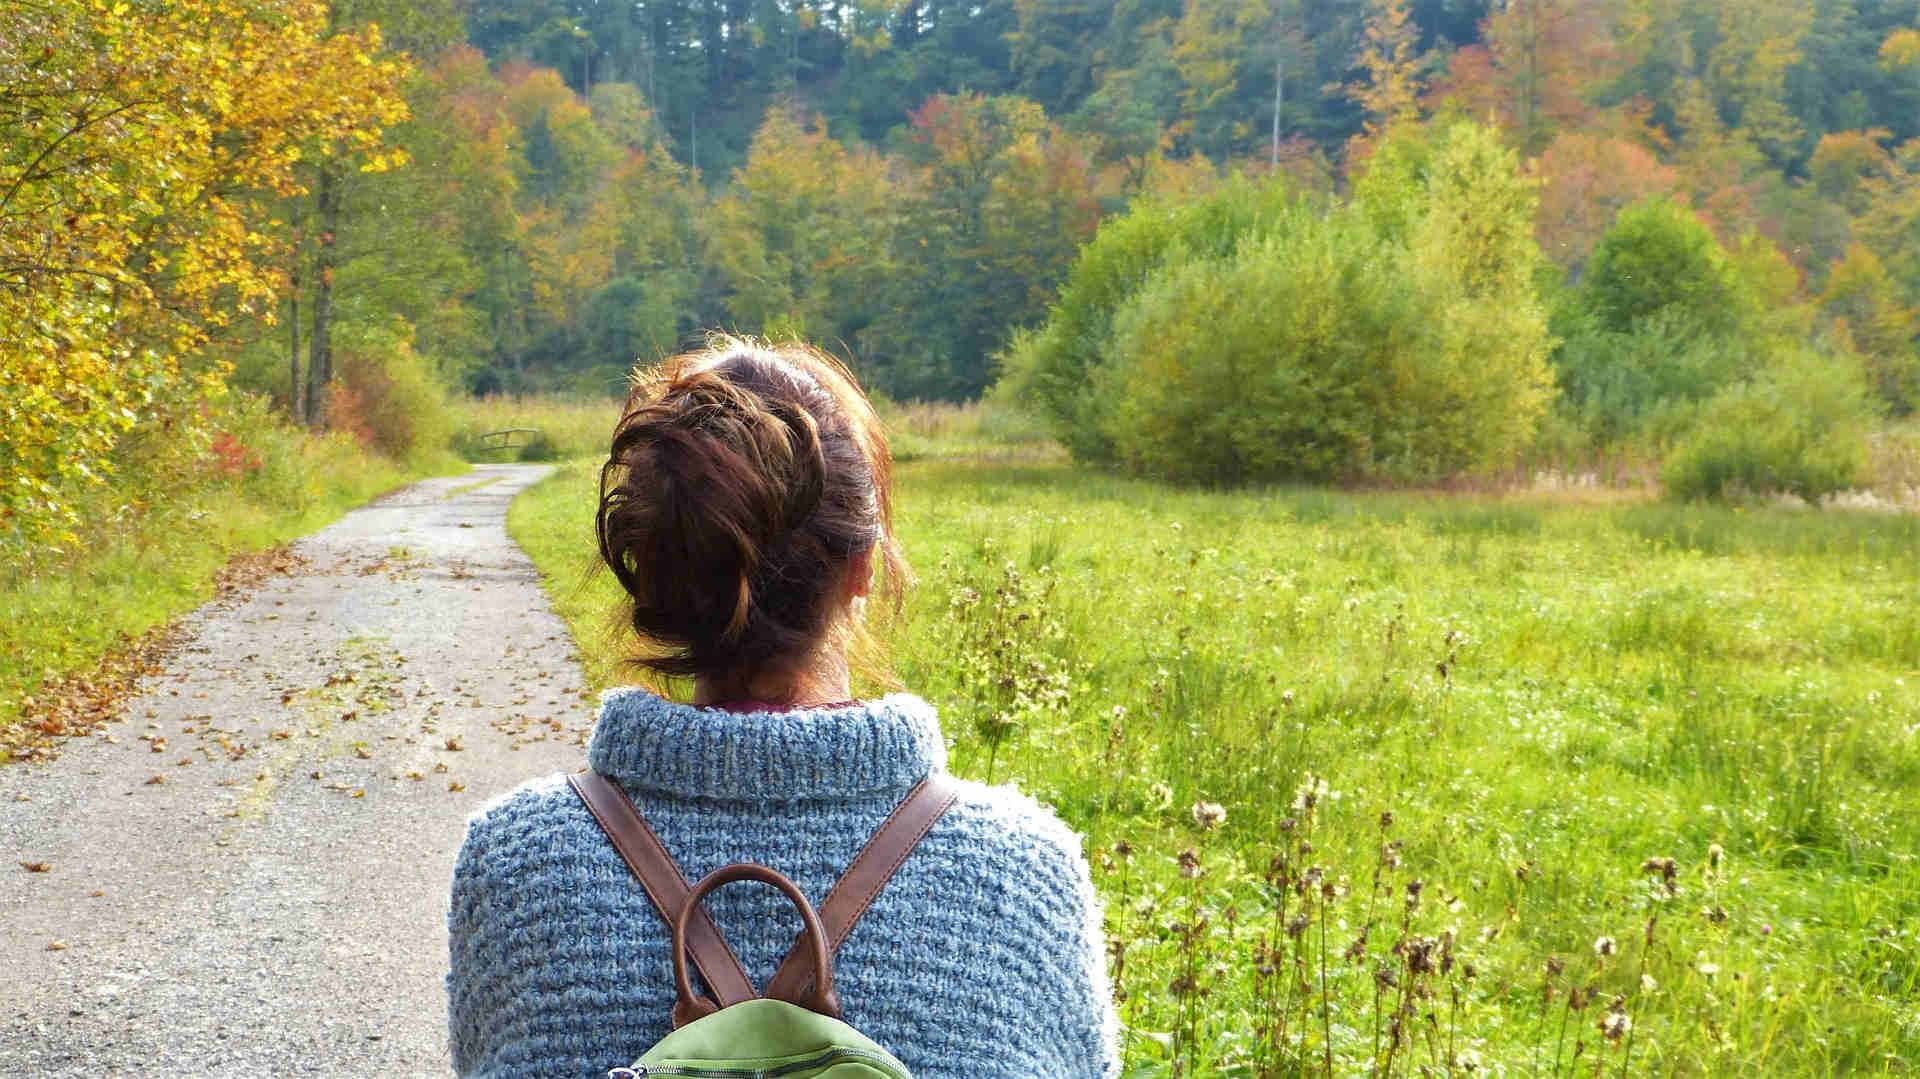 Barbarossaweg wandern – Tipps zum Wandern